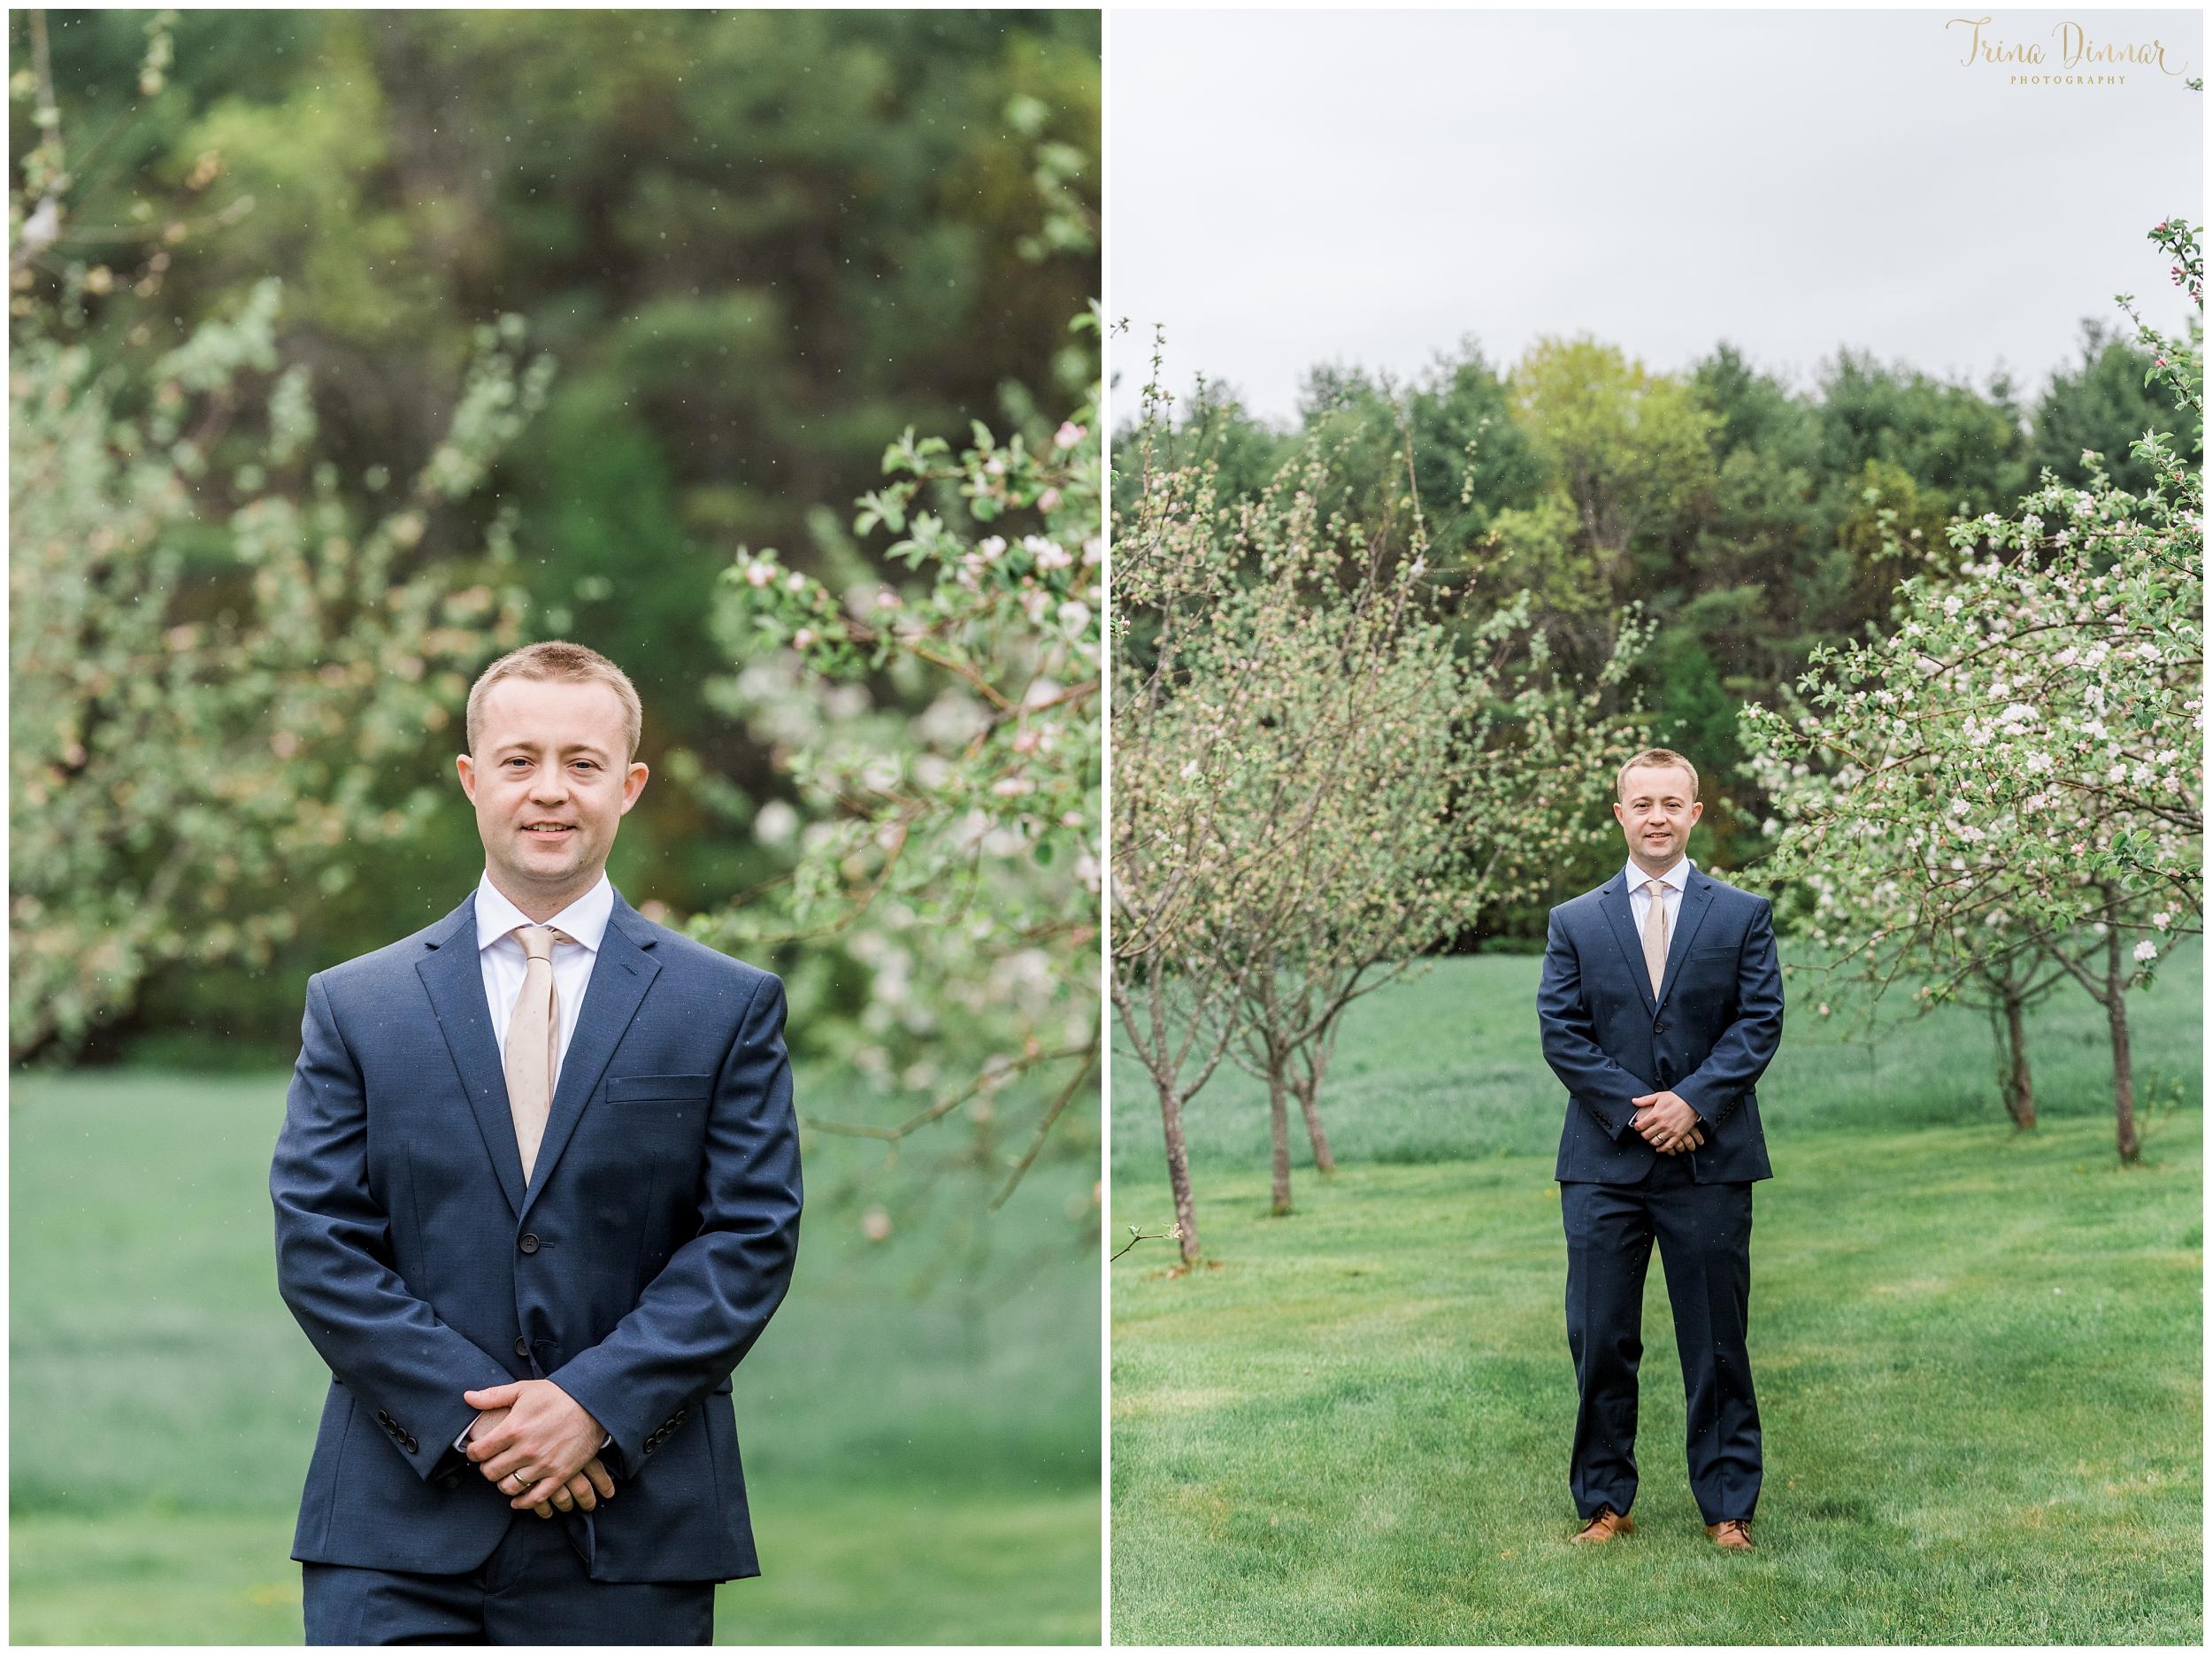 Maine Groom Apple Blossom Portraits